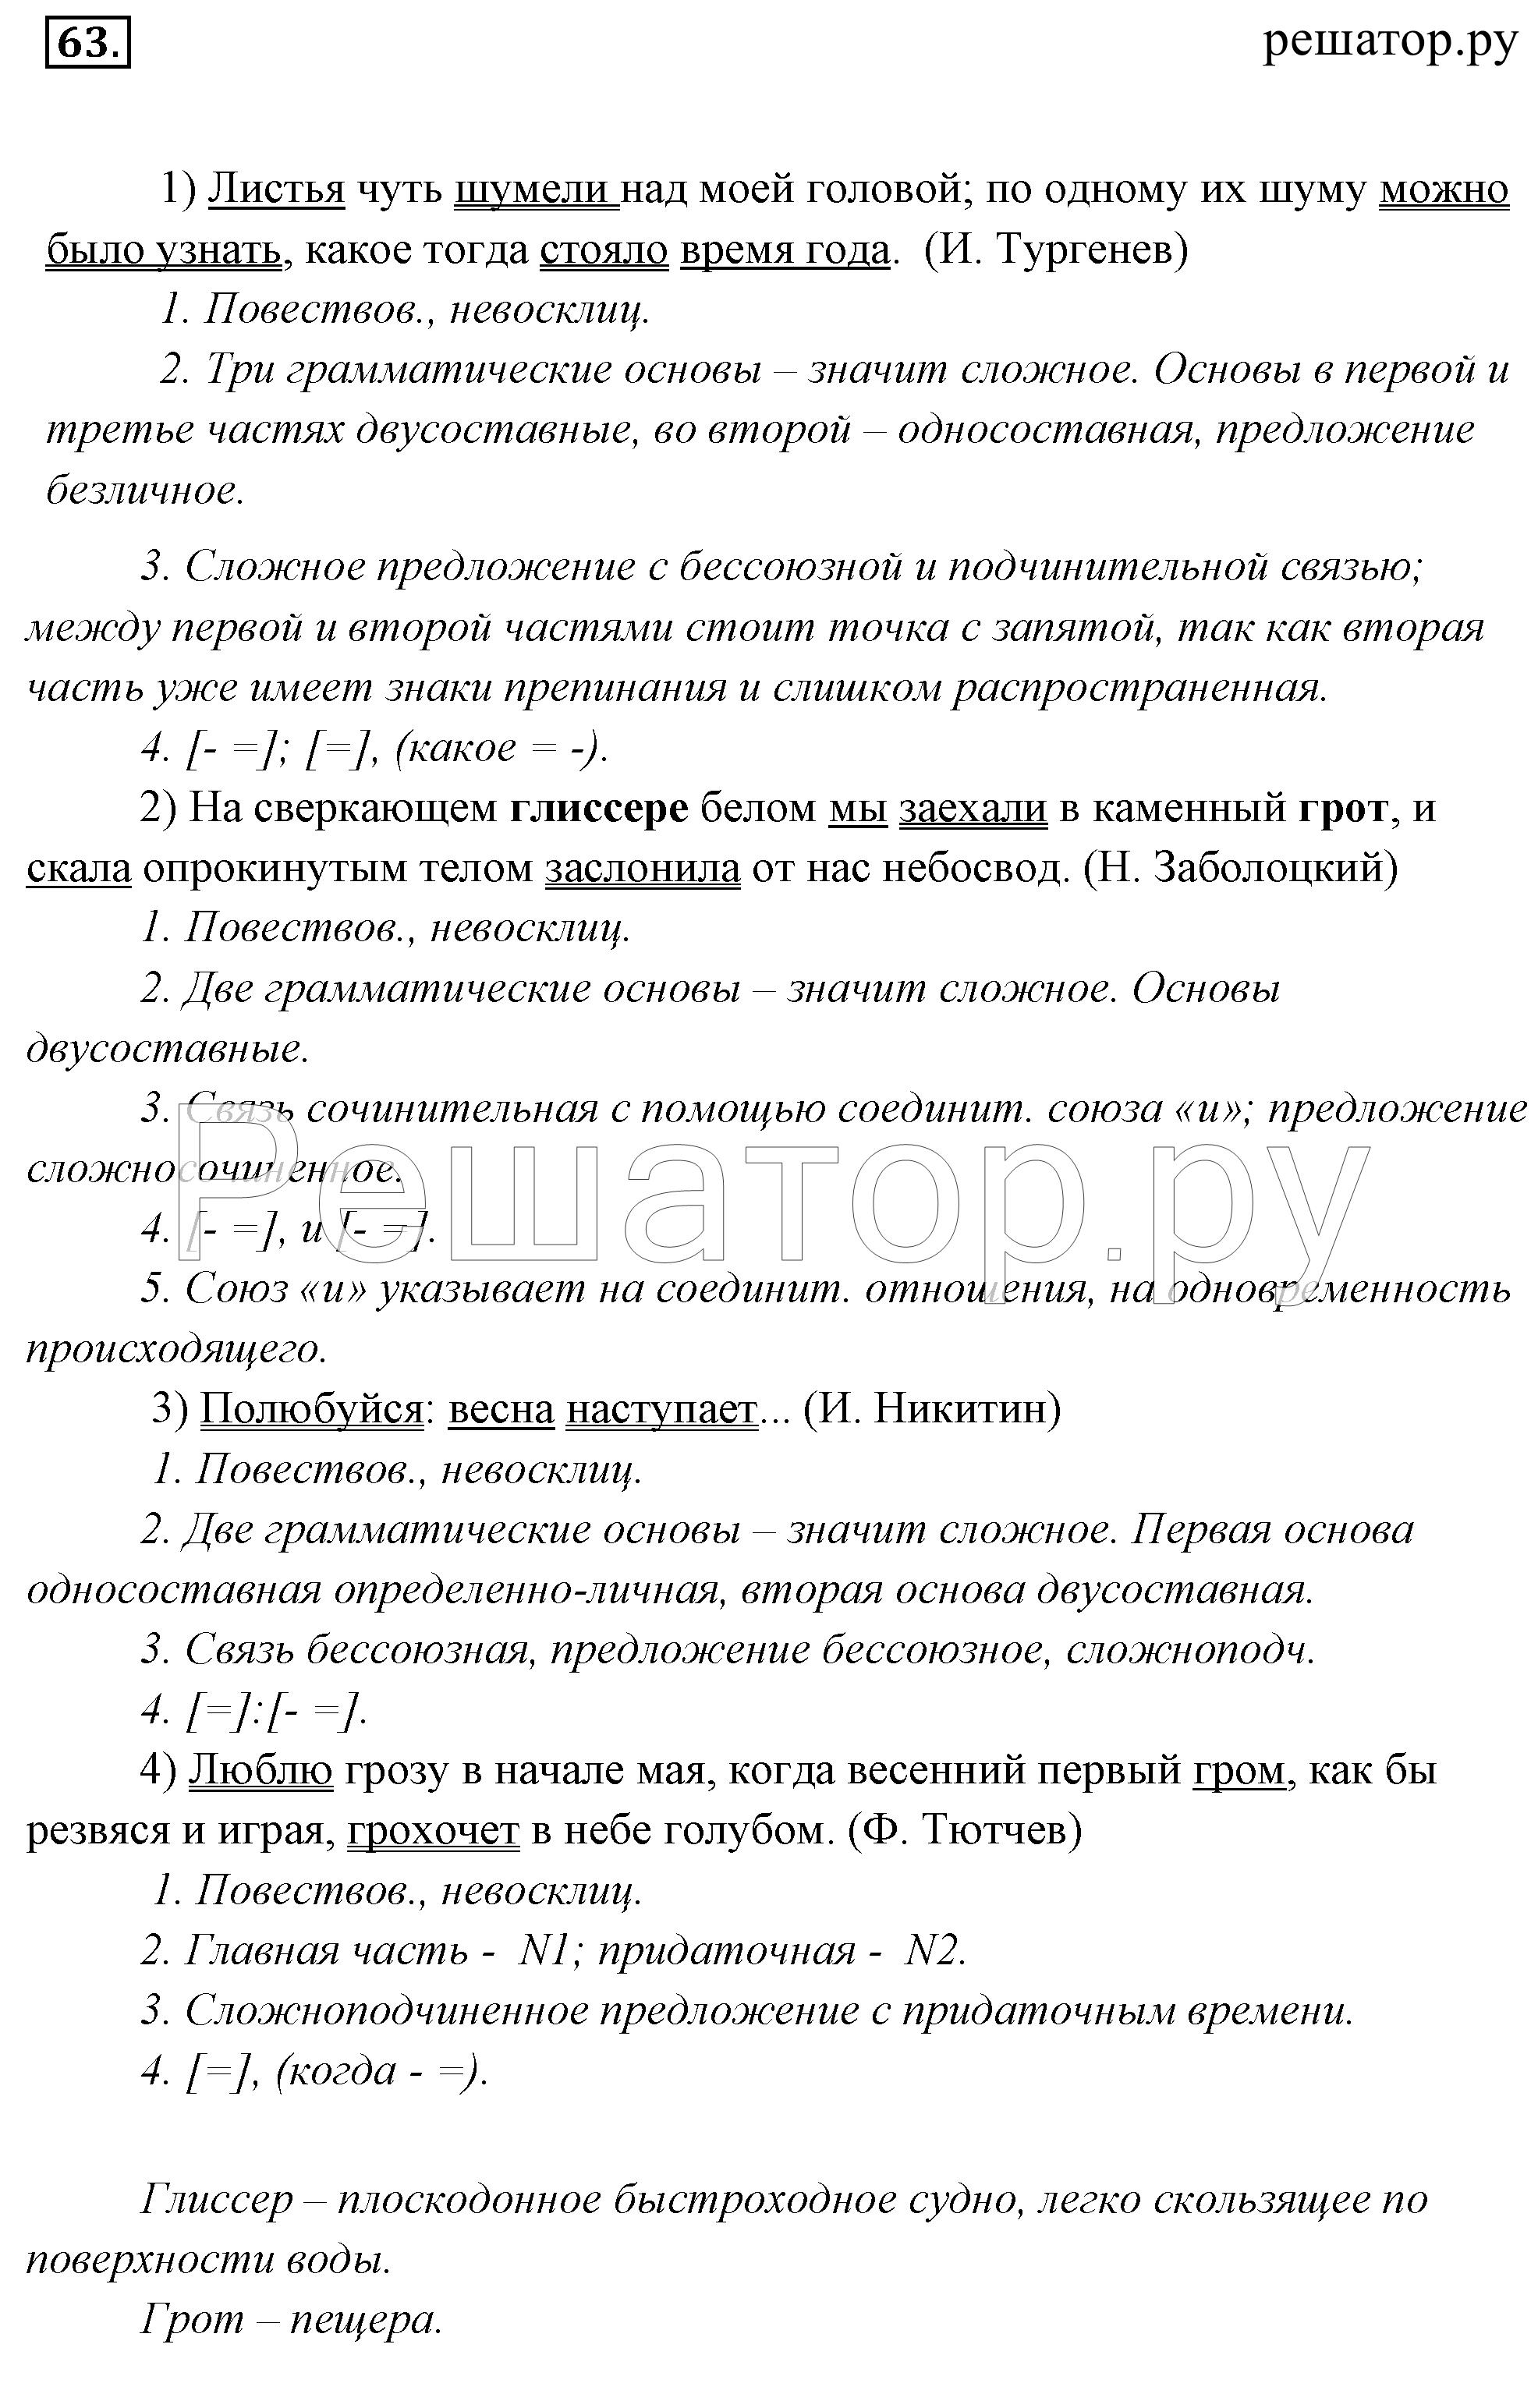 Гдз по русскому языку 9 класс разумовская 2018 онлай